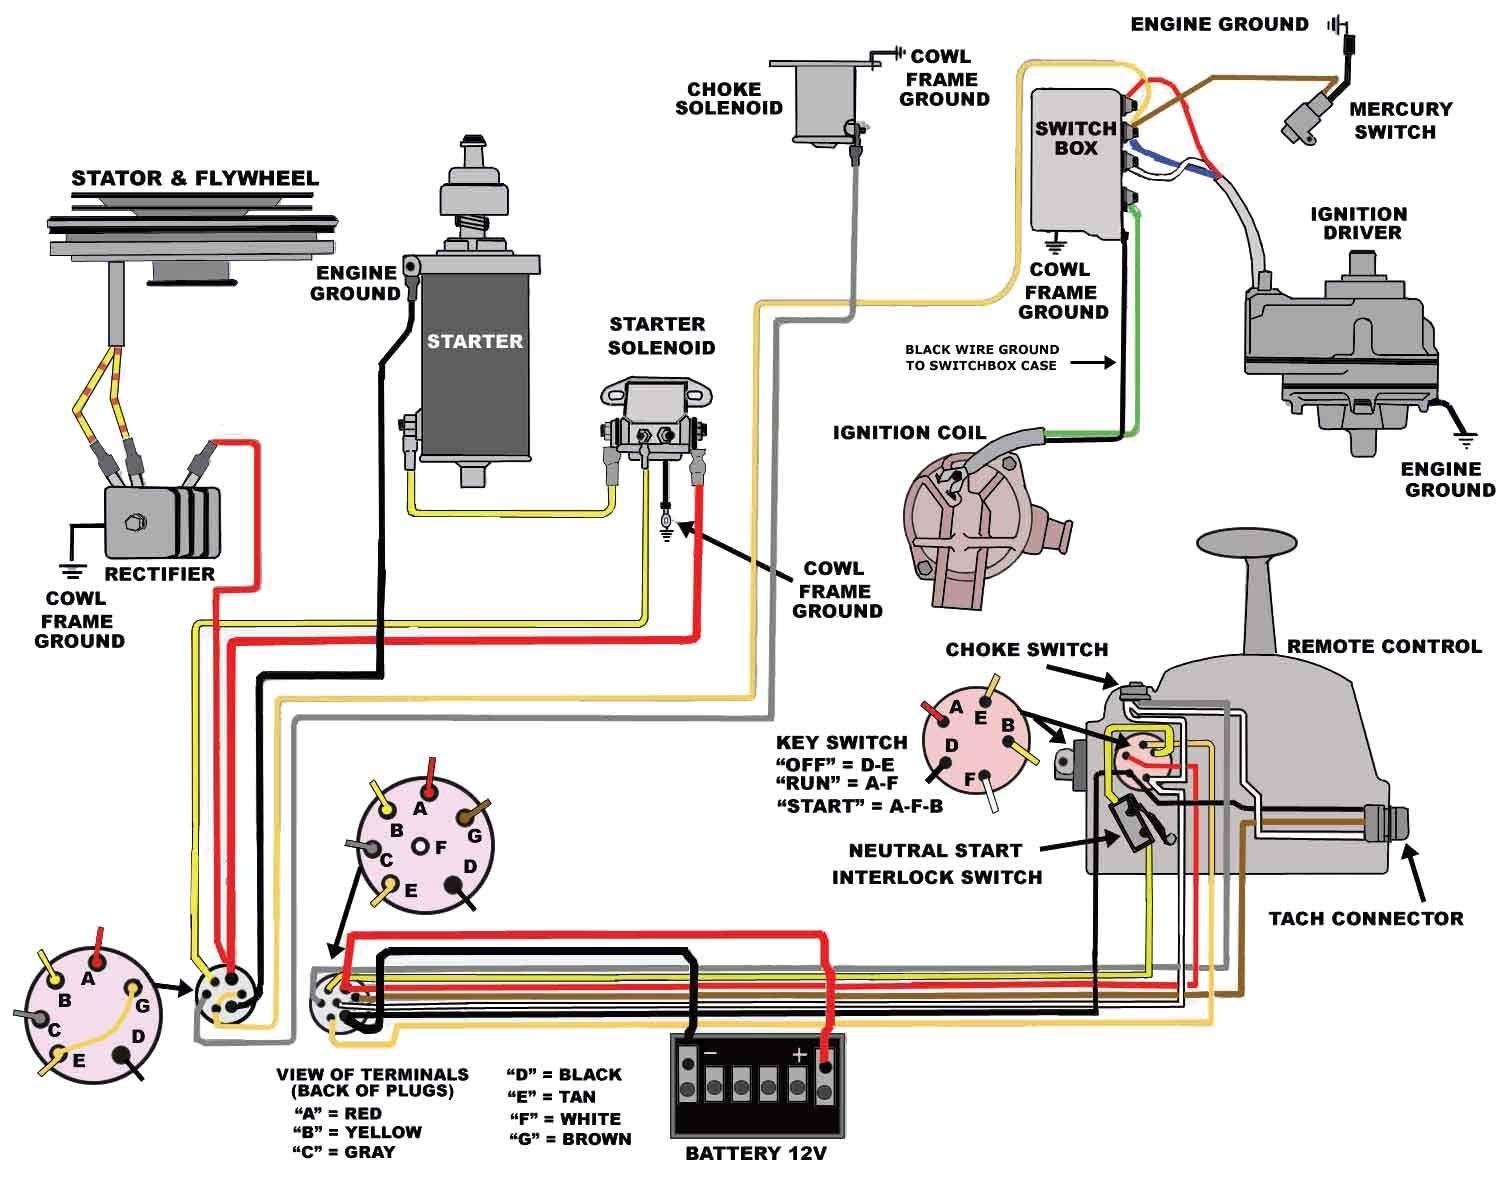 Mercury Key Switch Wiring Diagram